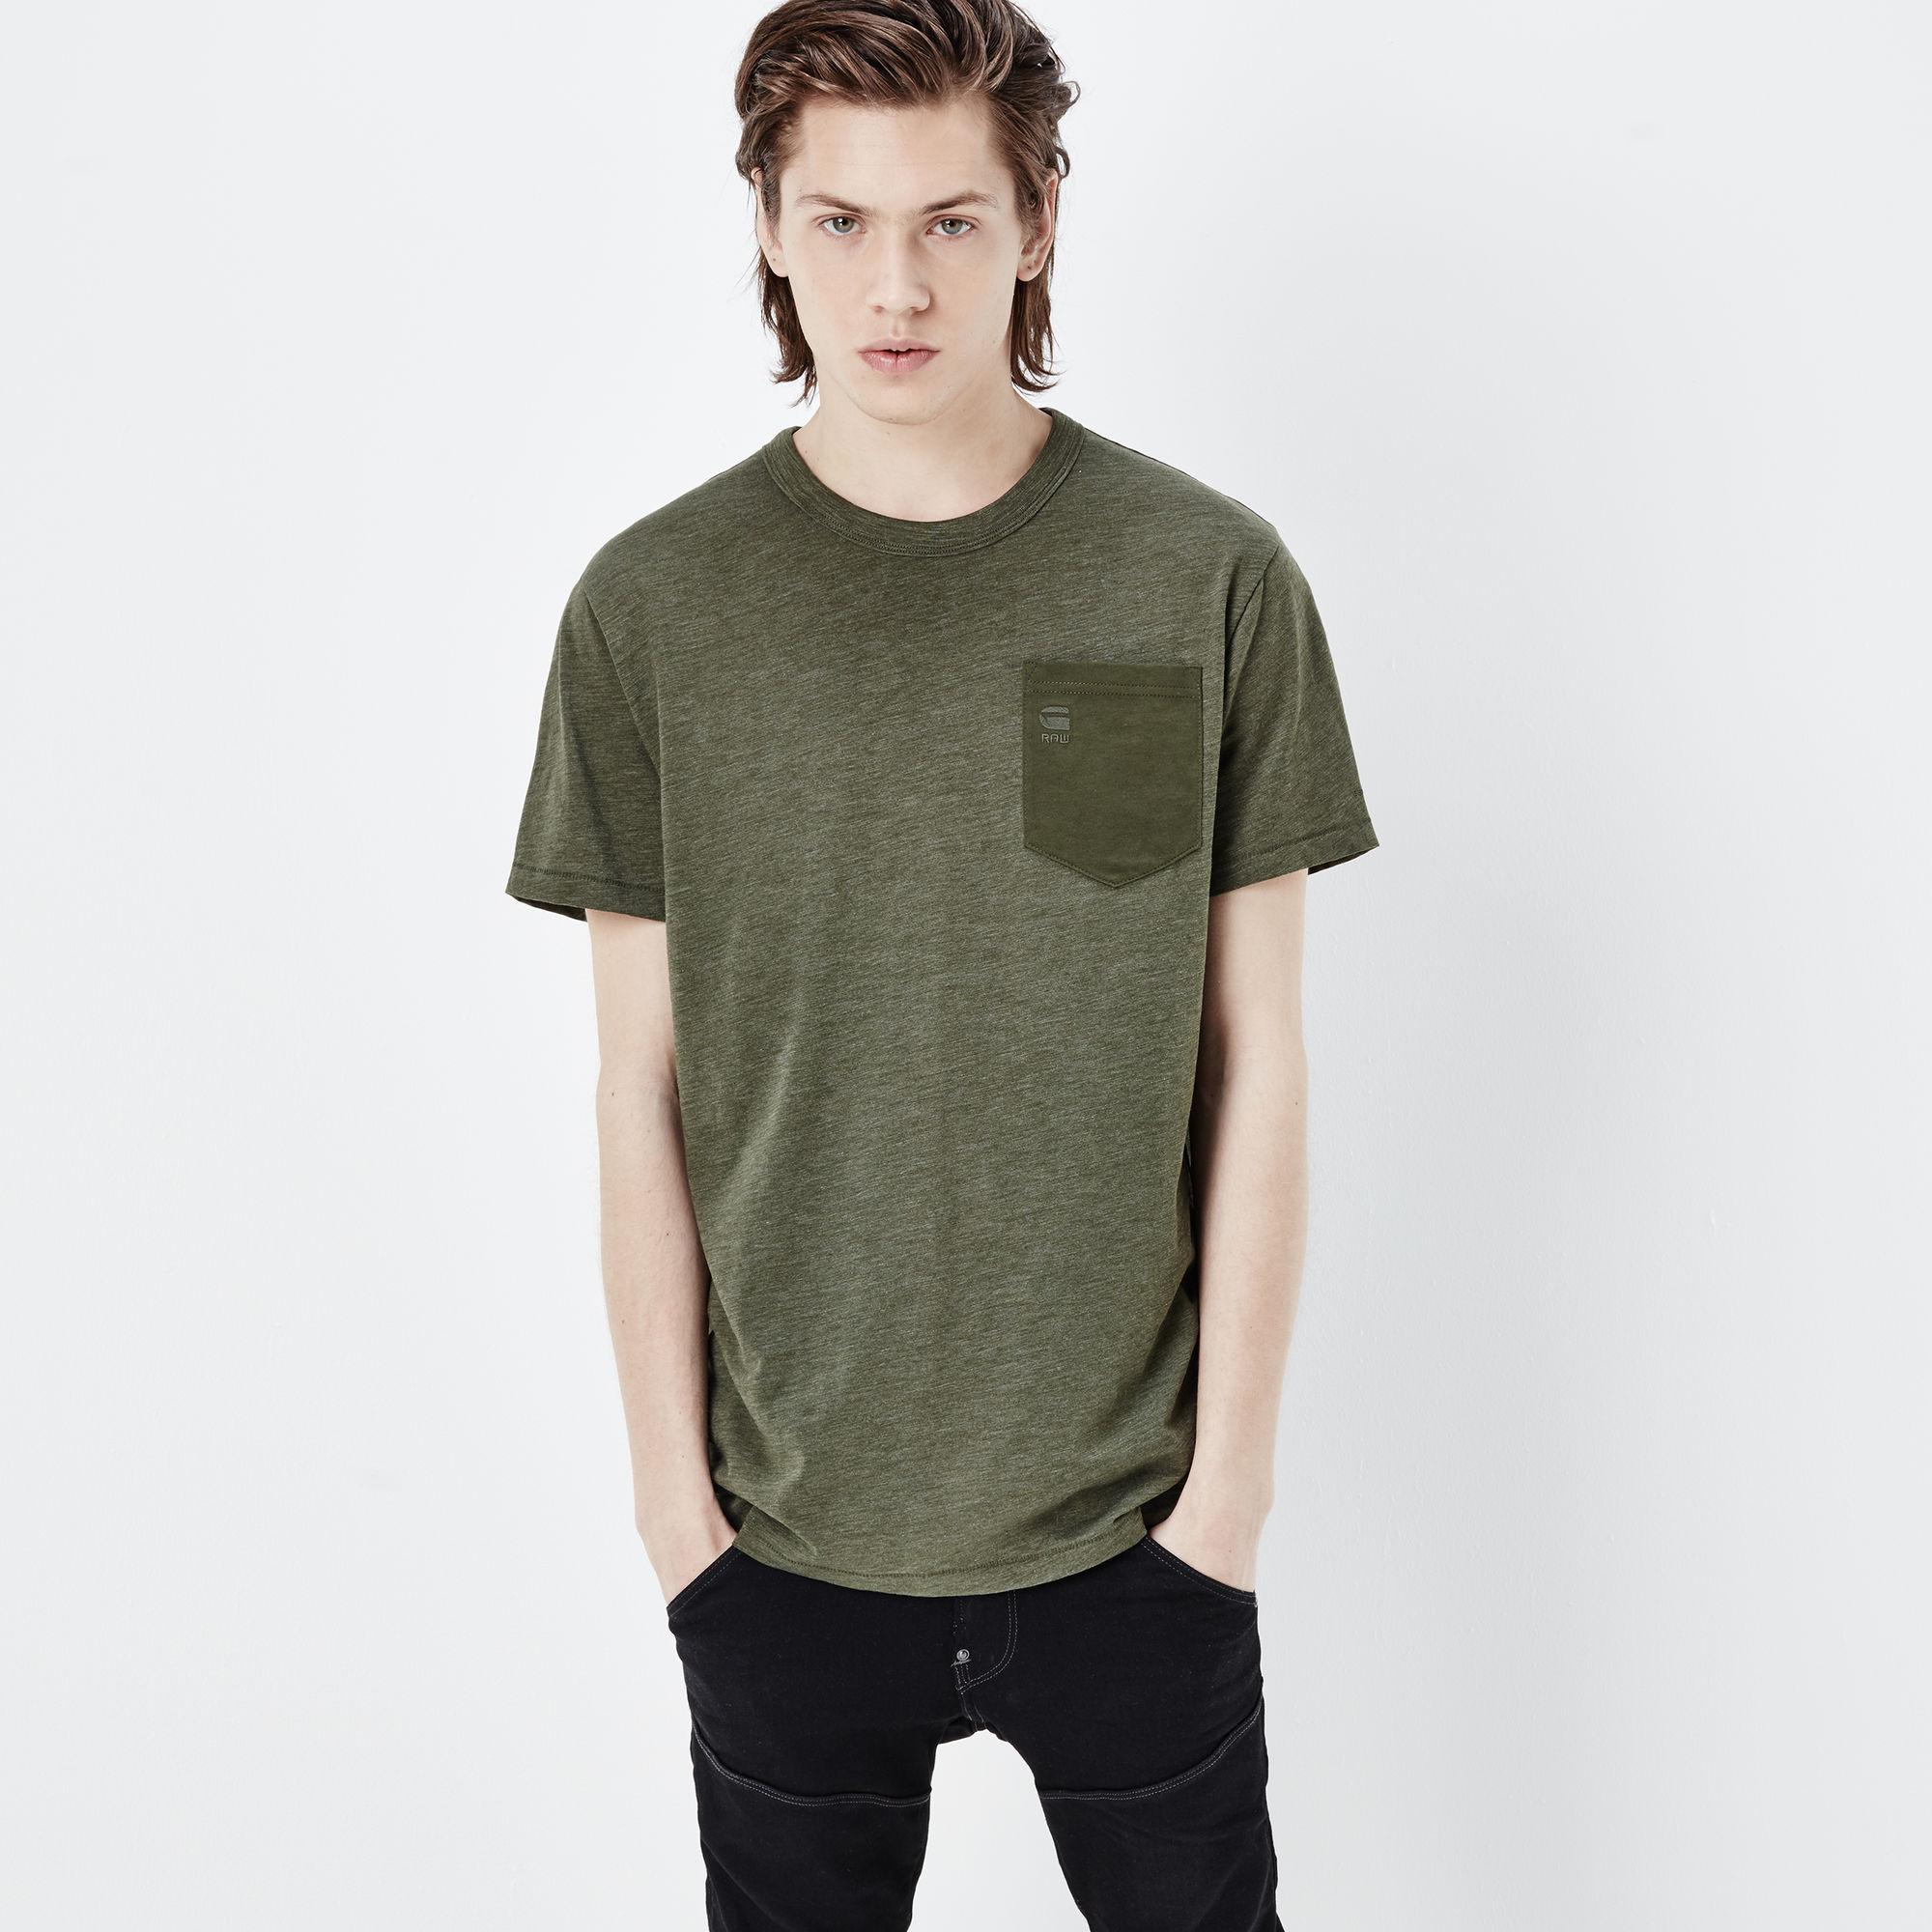 Varos Pocket T-shirt